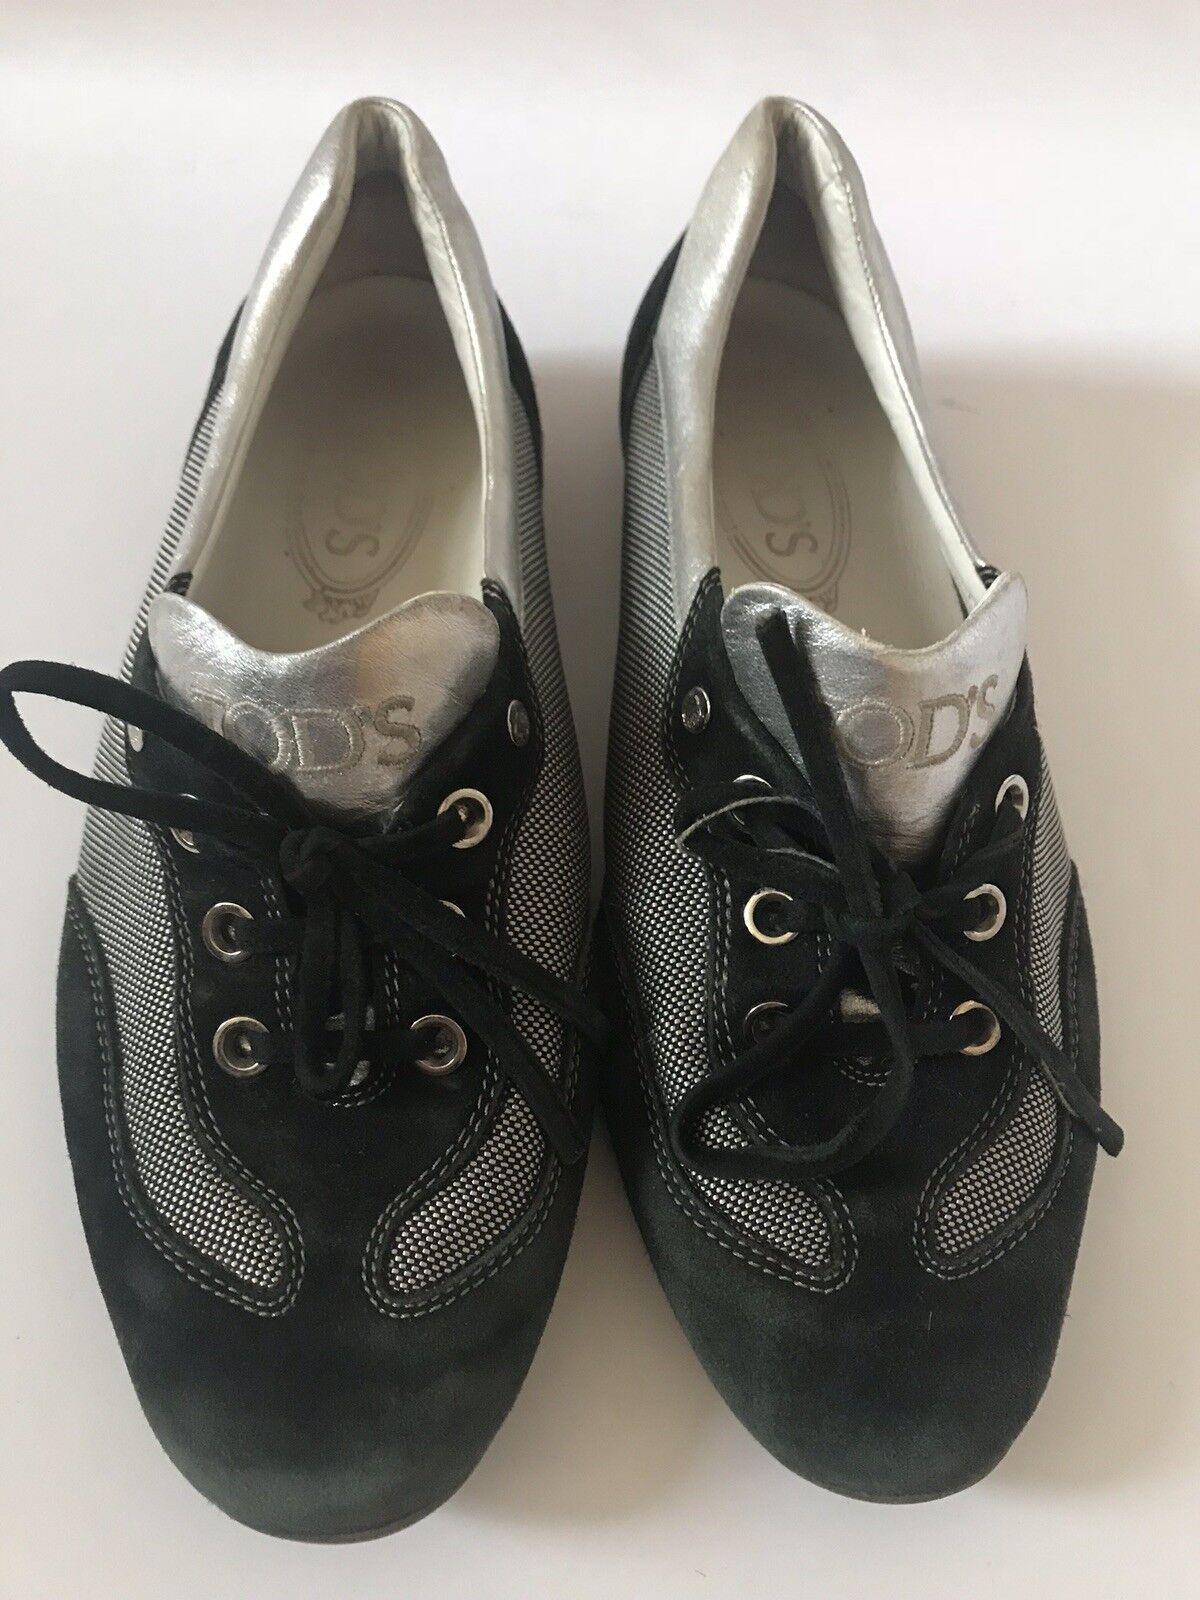 Todd's Mujer Zapatos Keds Plata Negro Negro Negro Lona & De Ante Con Cordones US talla 8  perfecto